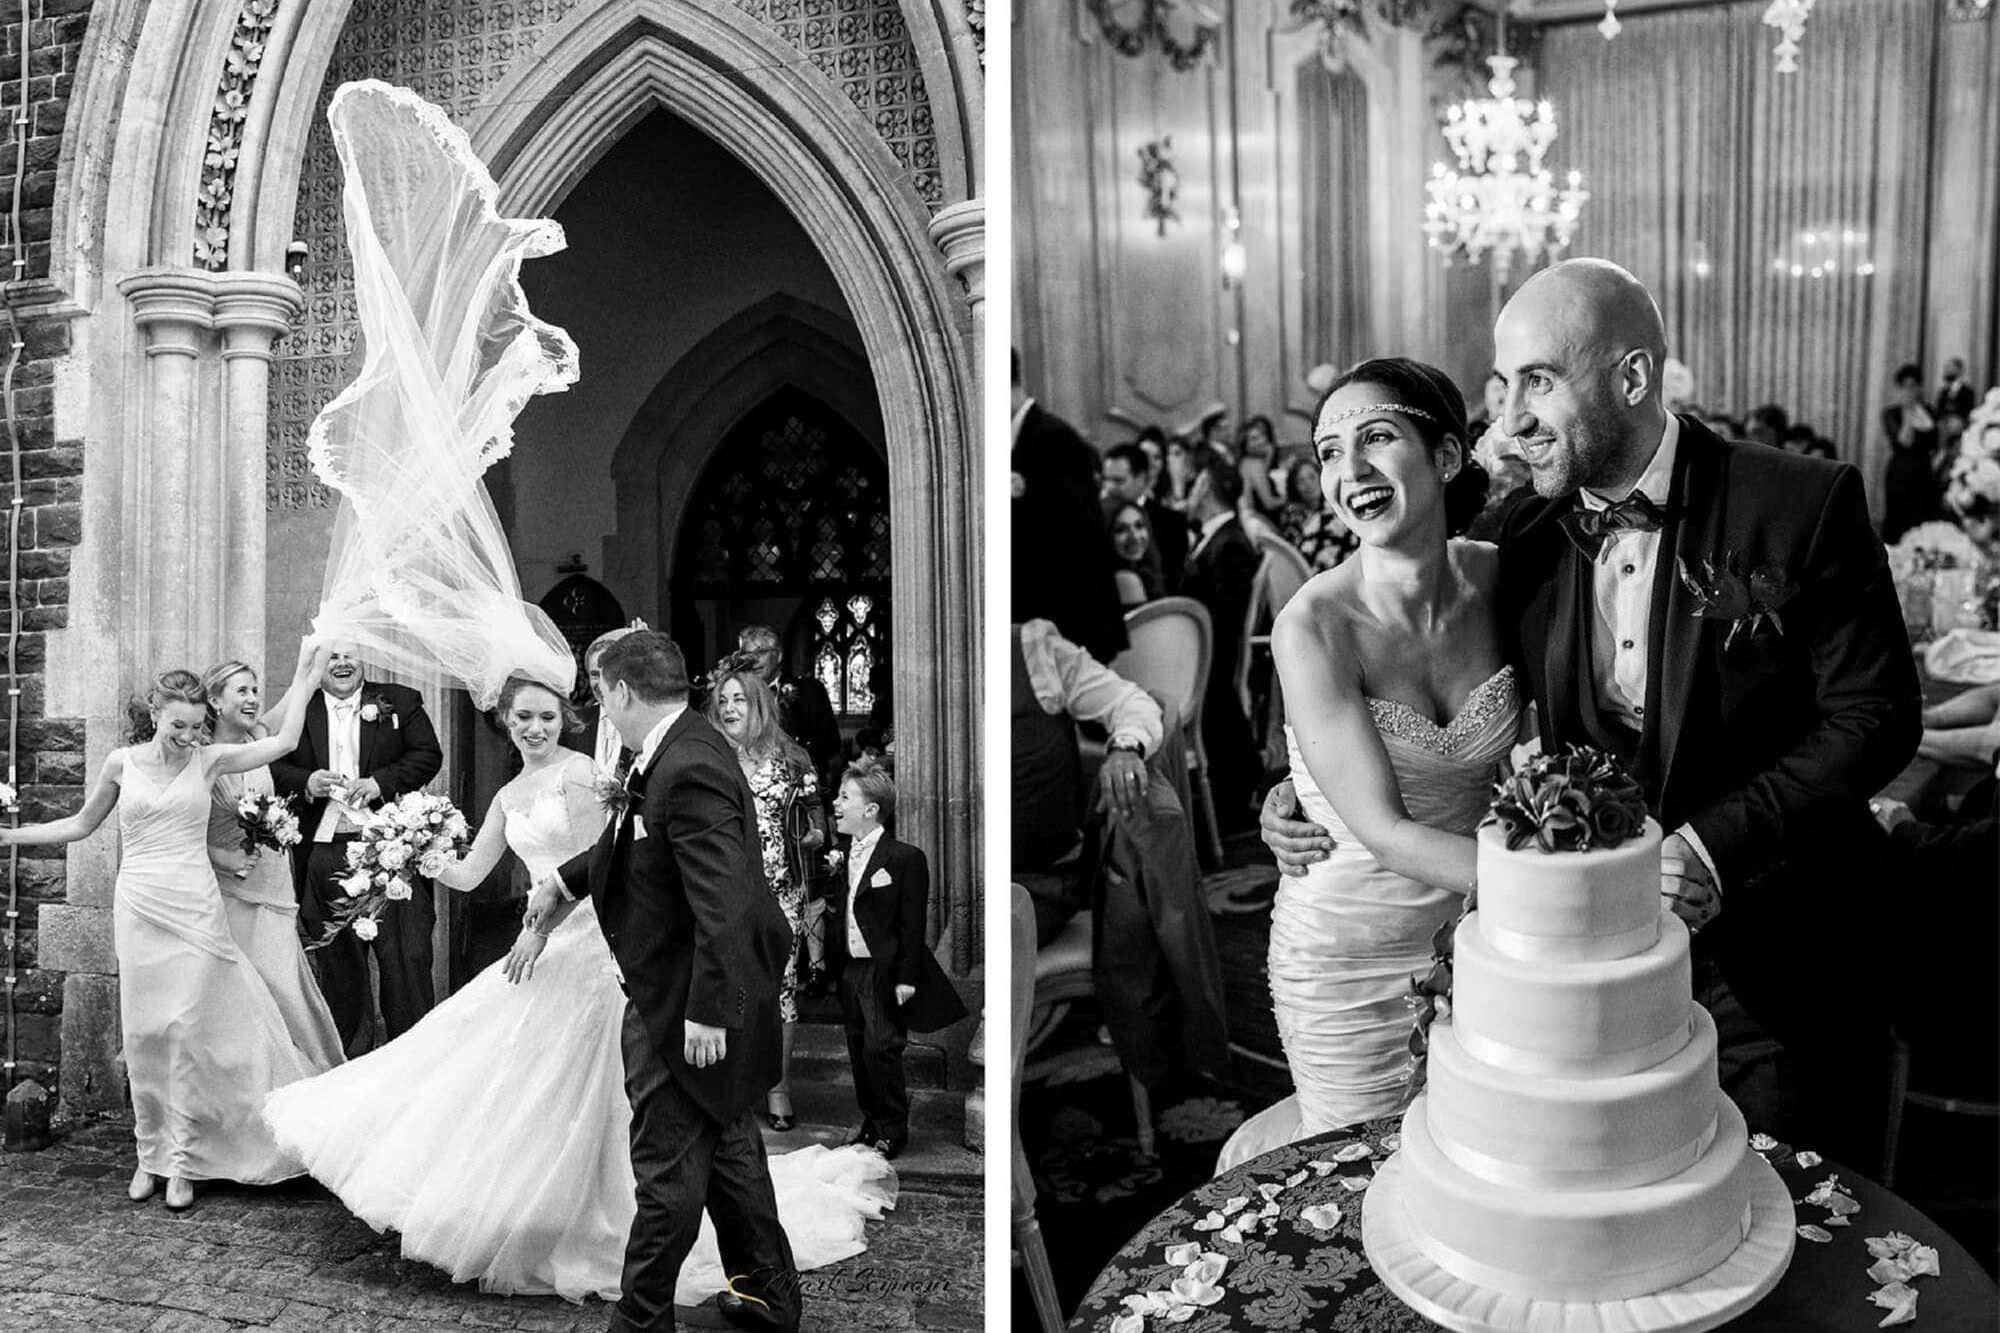 Mark-Seymour-Wedding-Photographer-UK-07 23